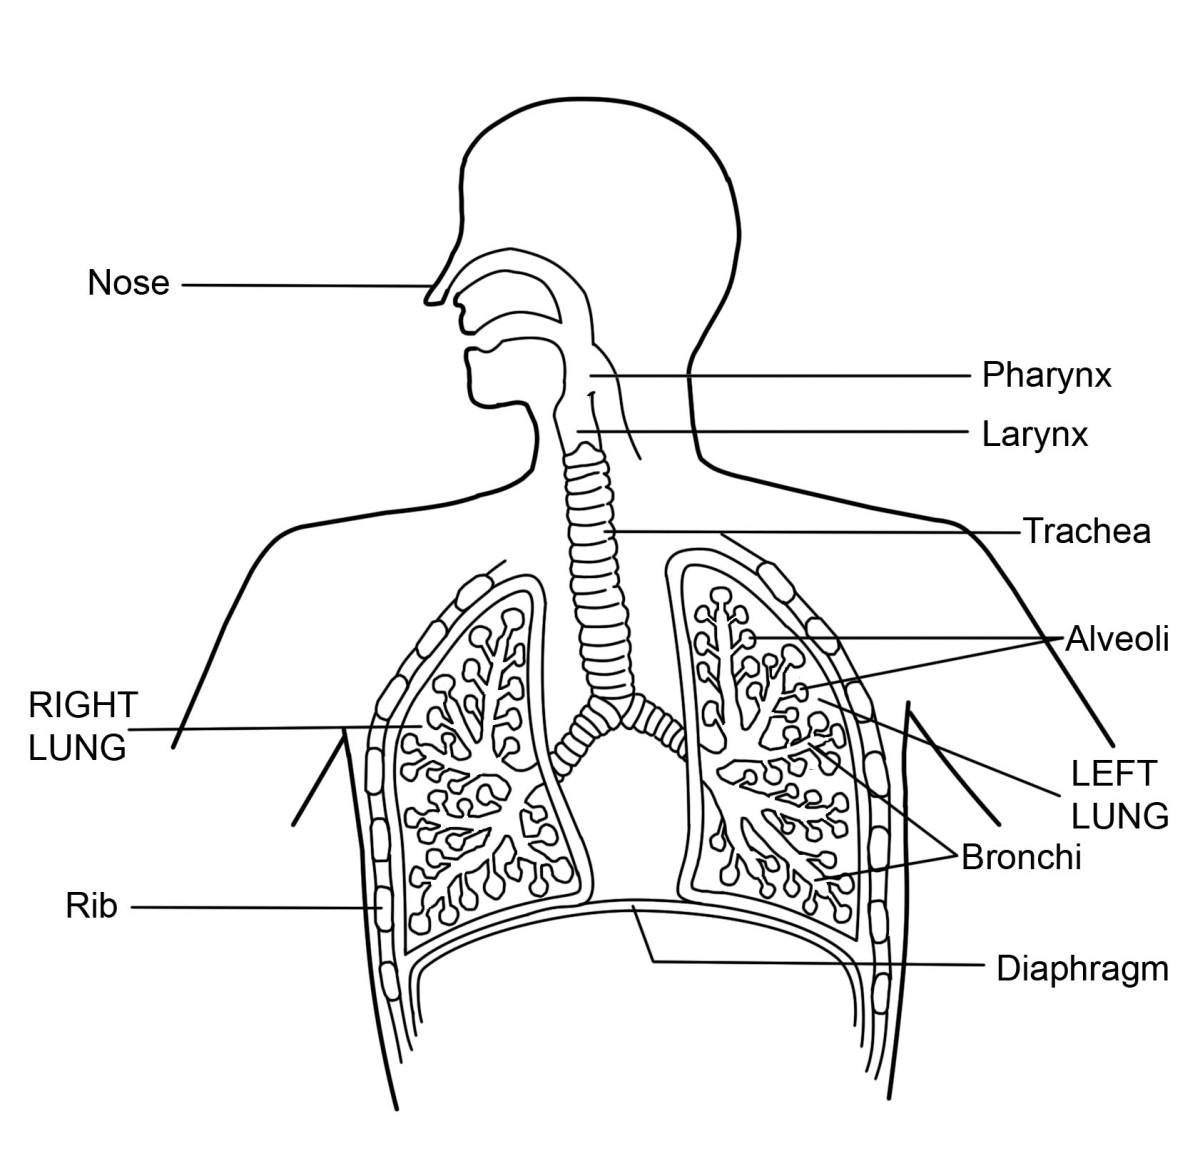 NOSE you breathe (inhale and exhale) air through your nos...